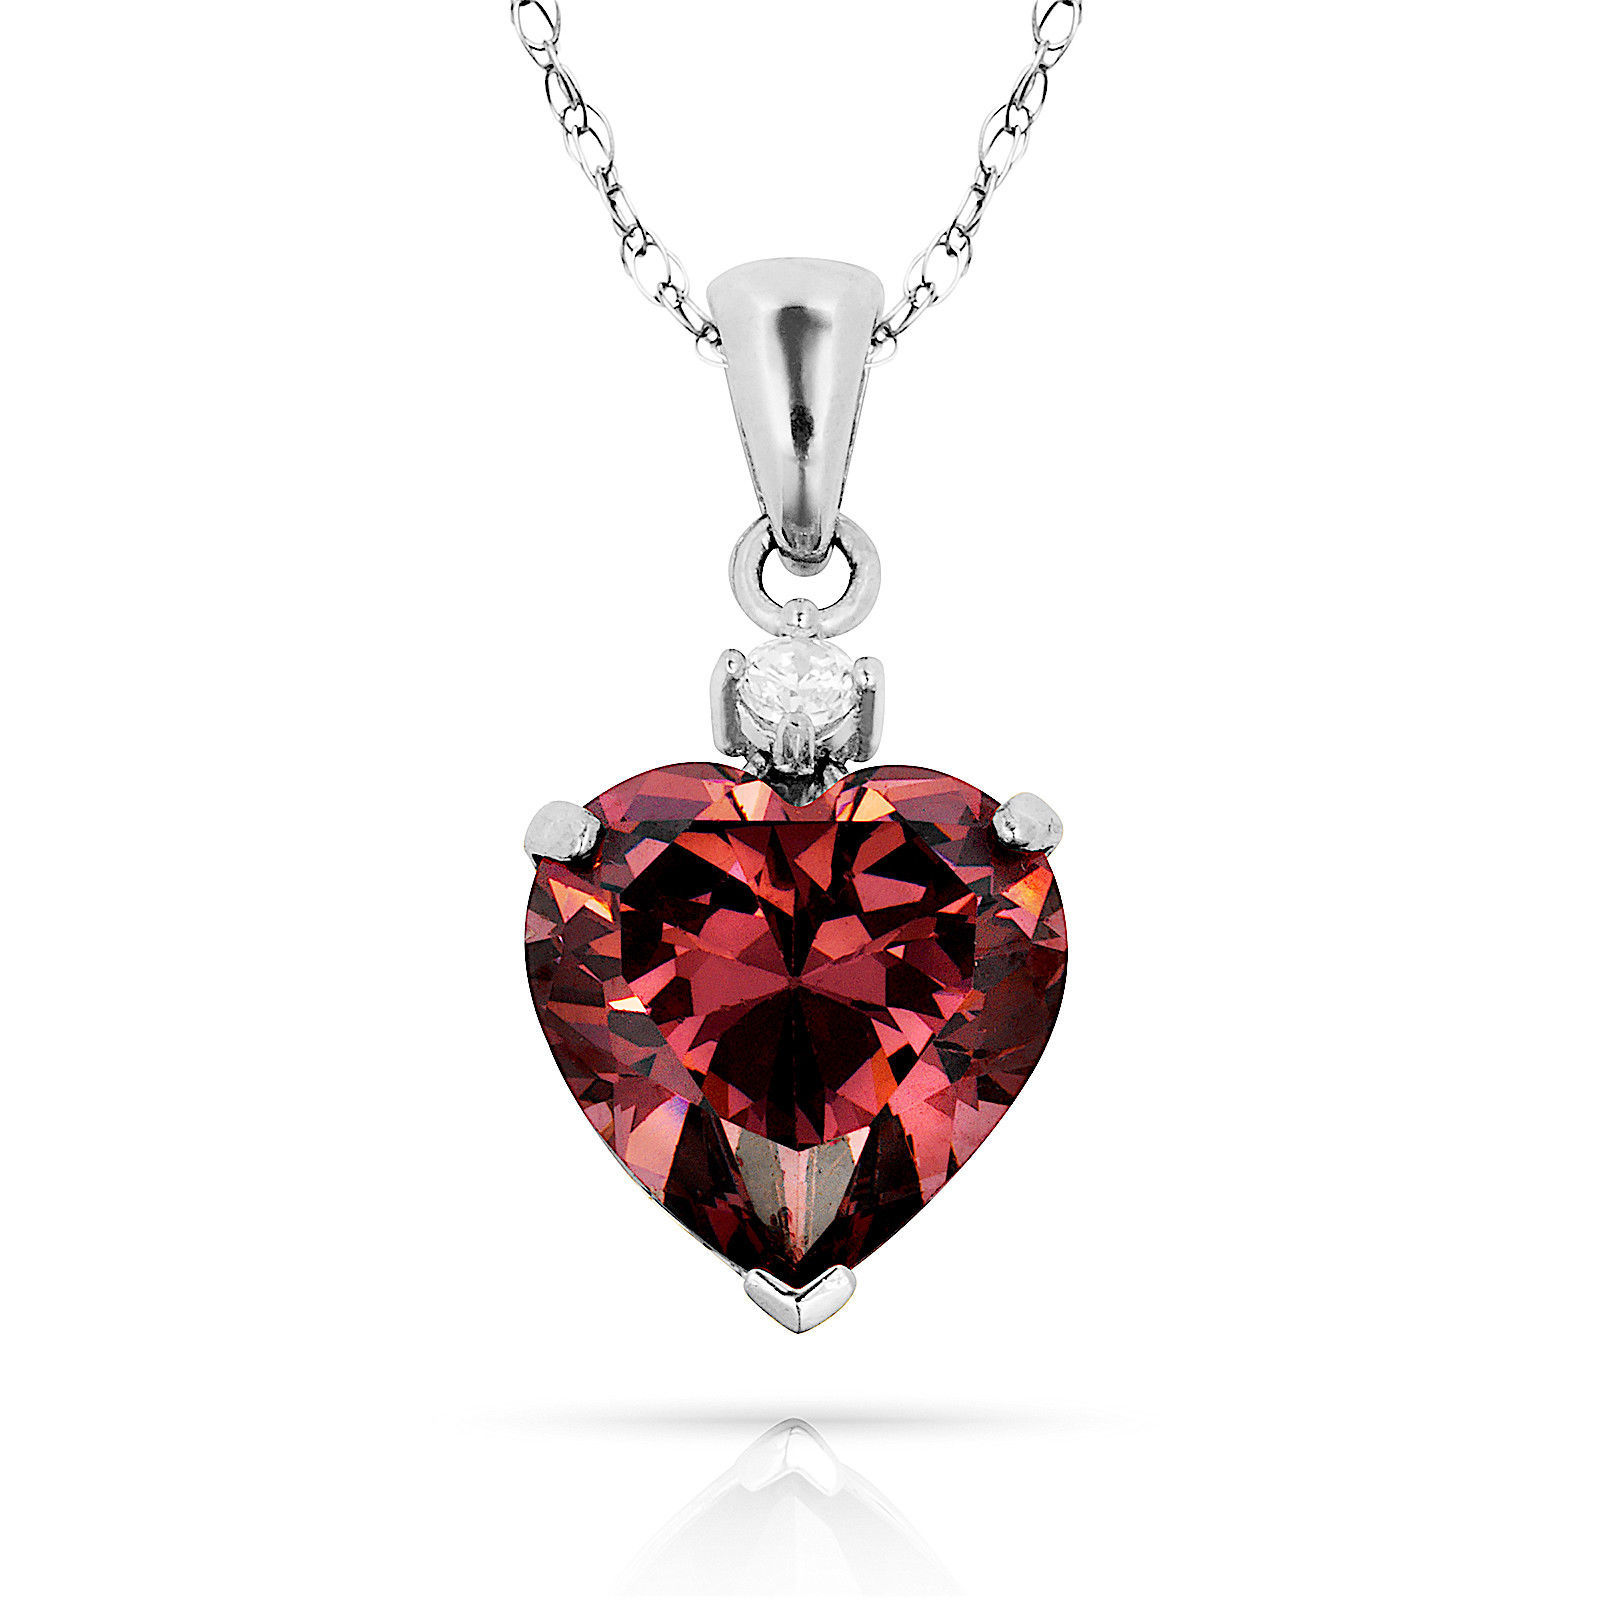 3.07Ct Created Diamond & Heart Alexandrite Charm Pendant14K White Gold w/Chain